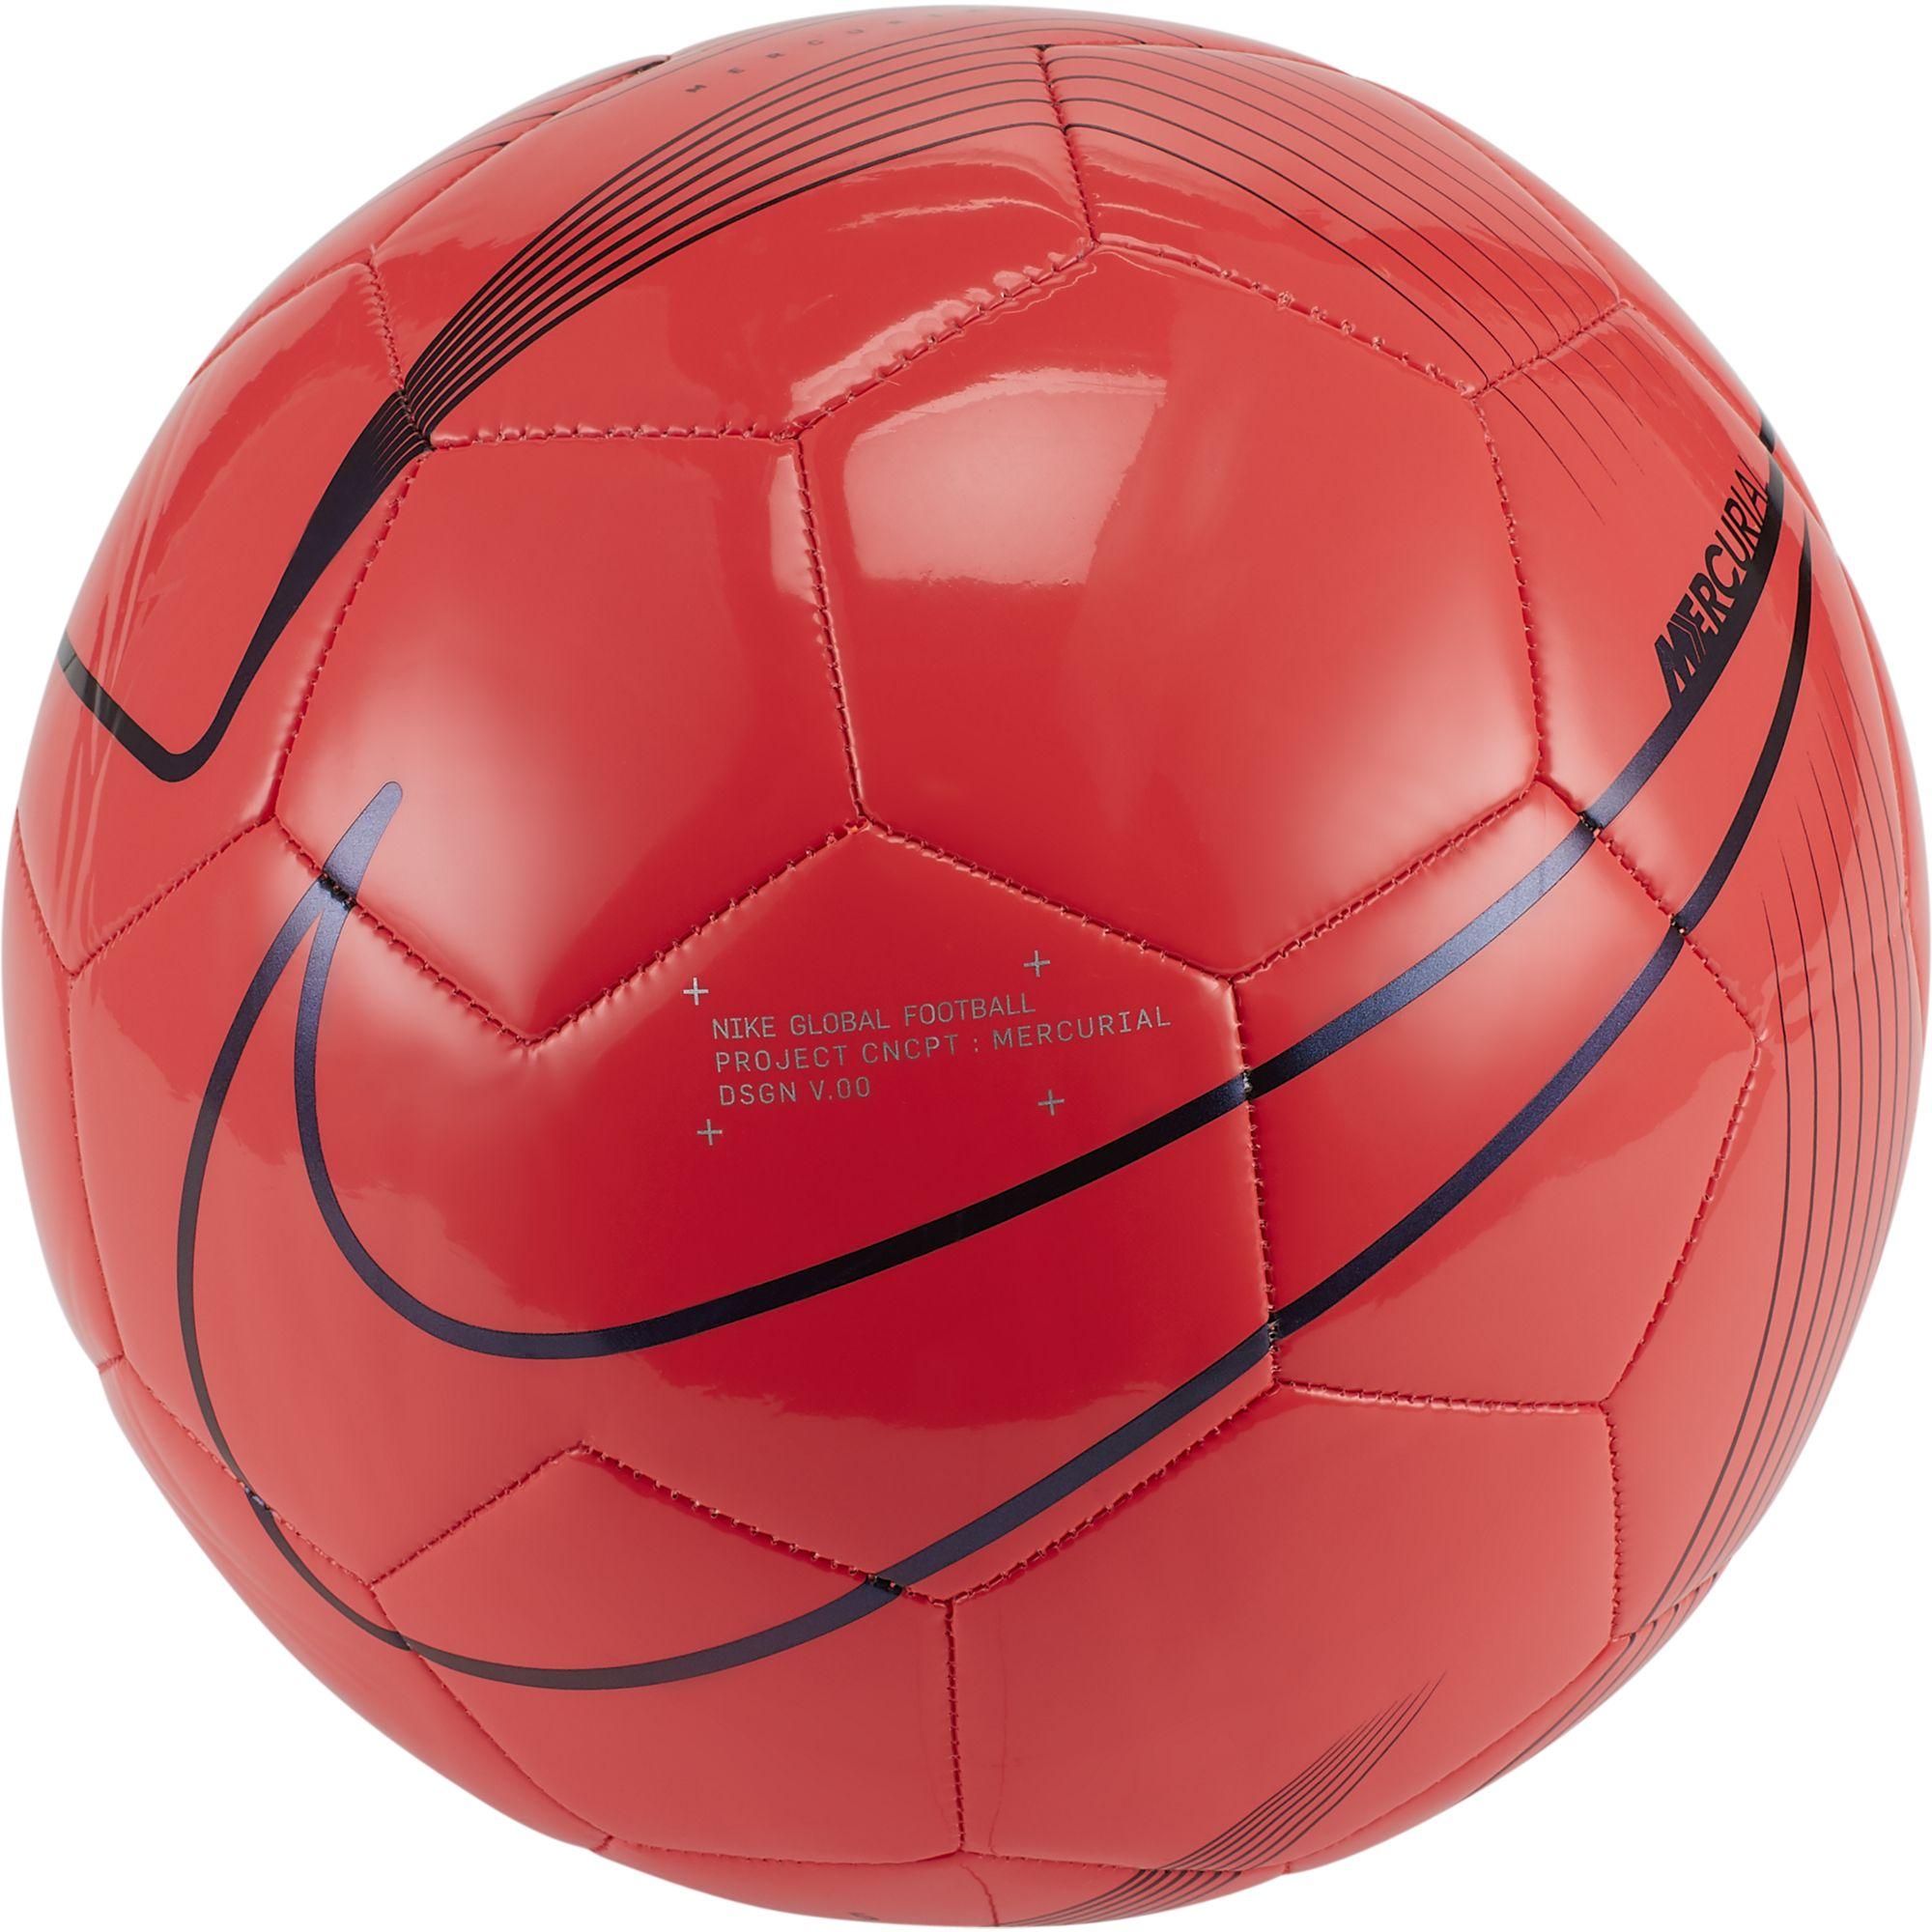 Mercurial Fade Soccerball, Crimson, swatch